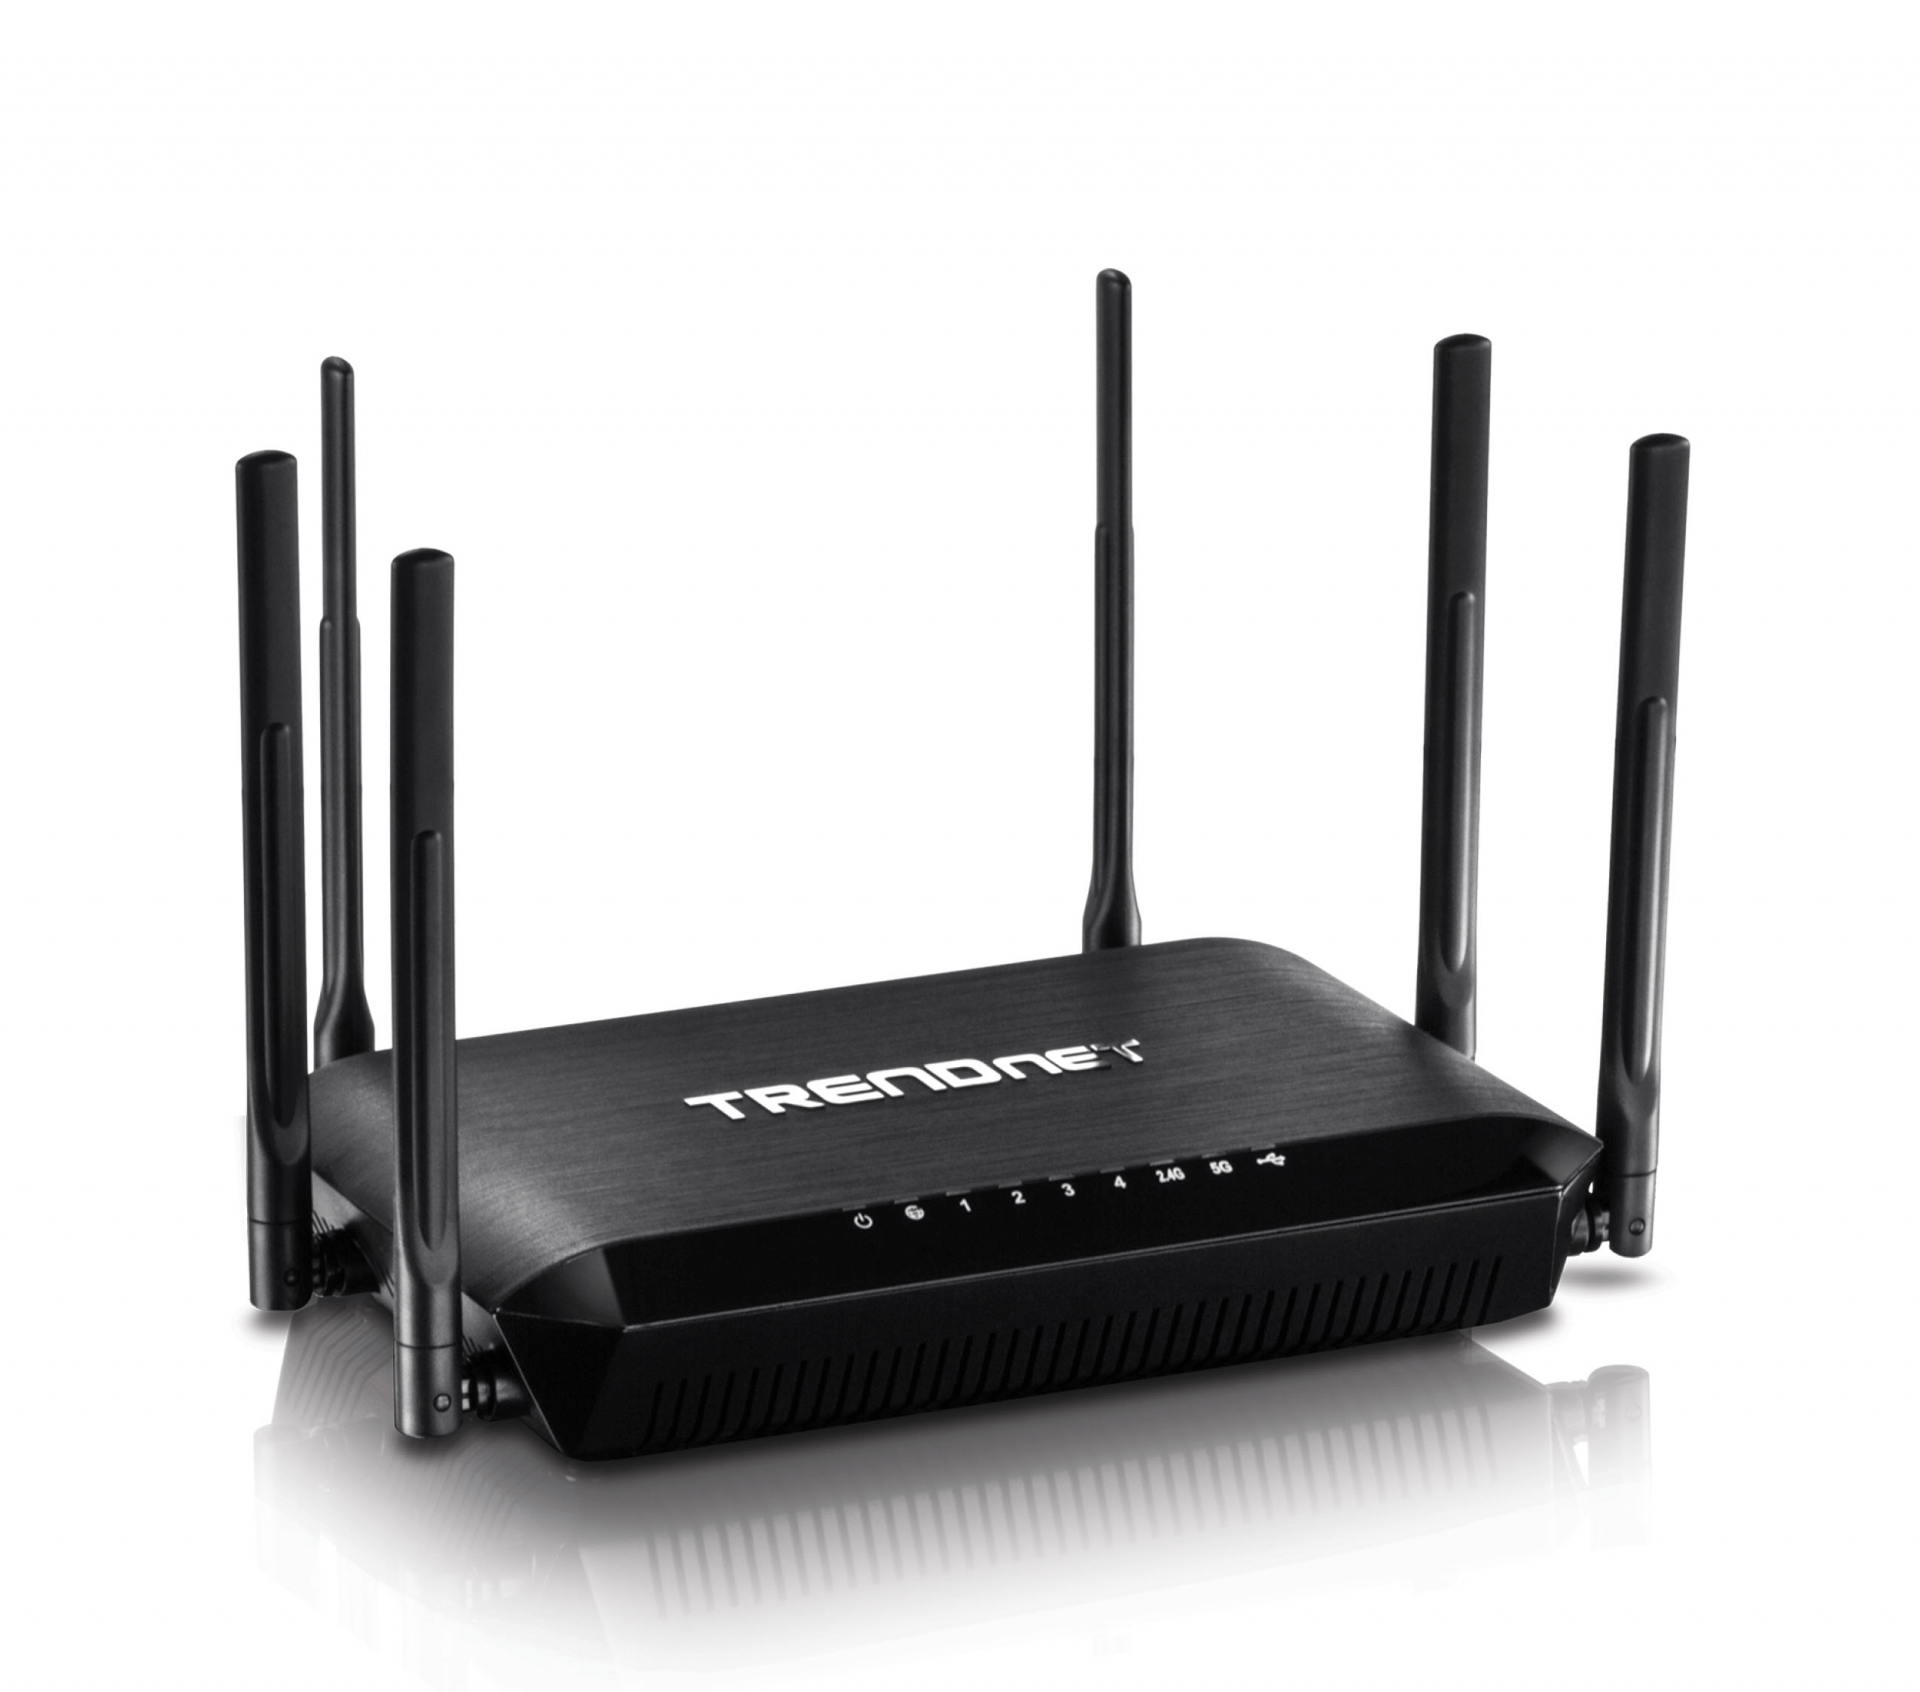 Doppelte AC-WLAN-Zellen: Trendnet präsentiert WLAN-Router der AC3200-Klasse